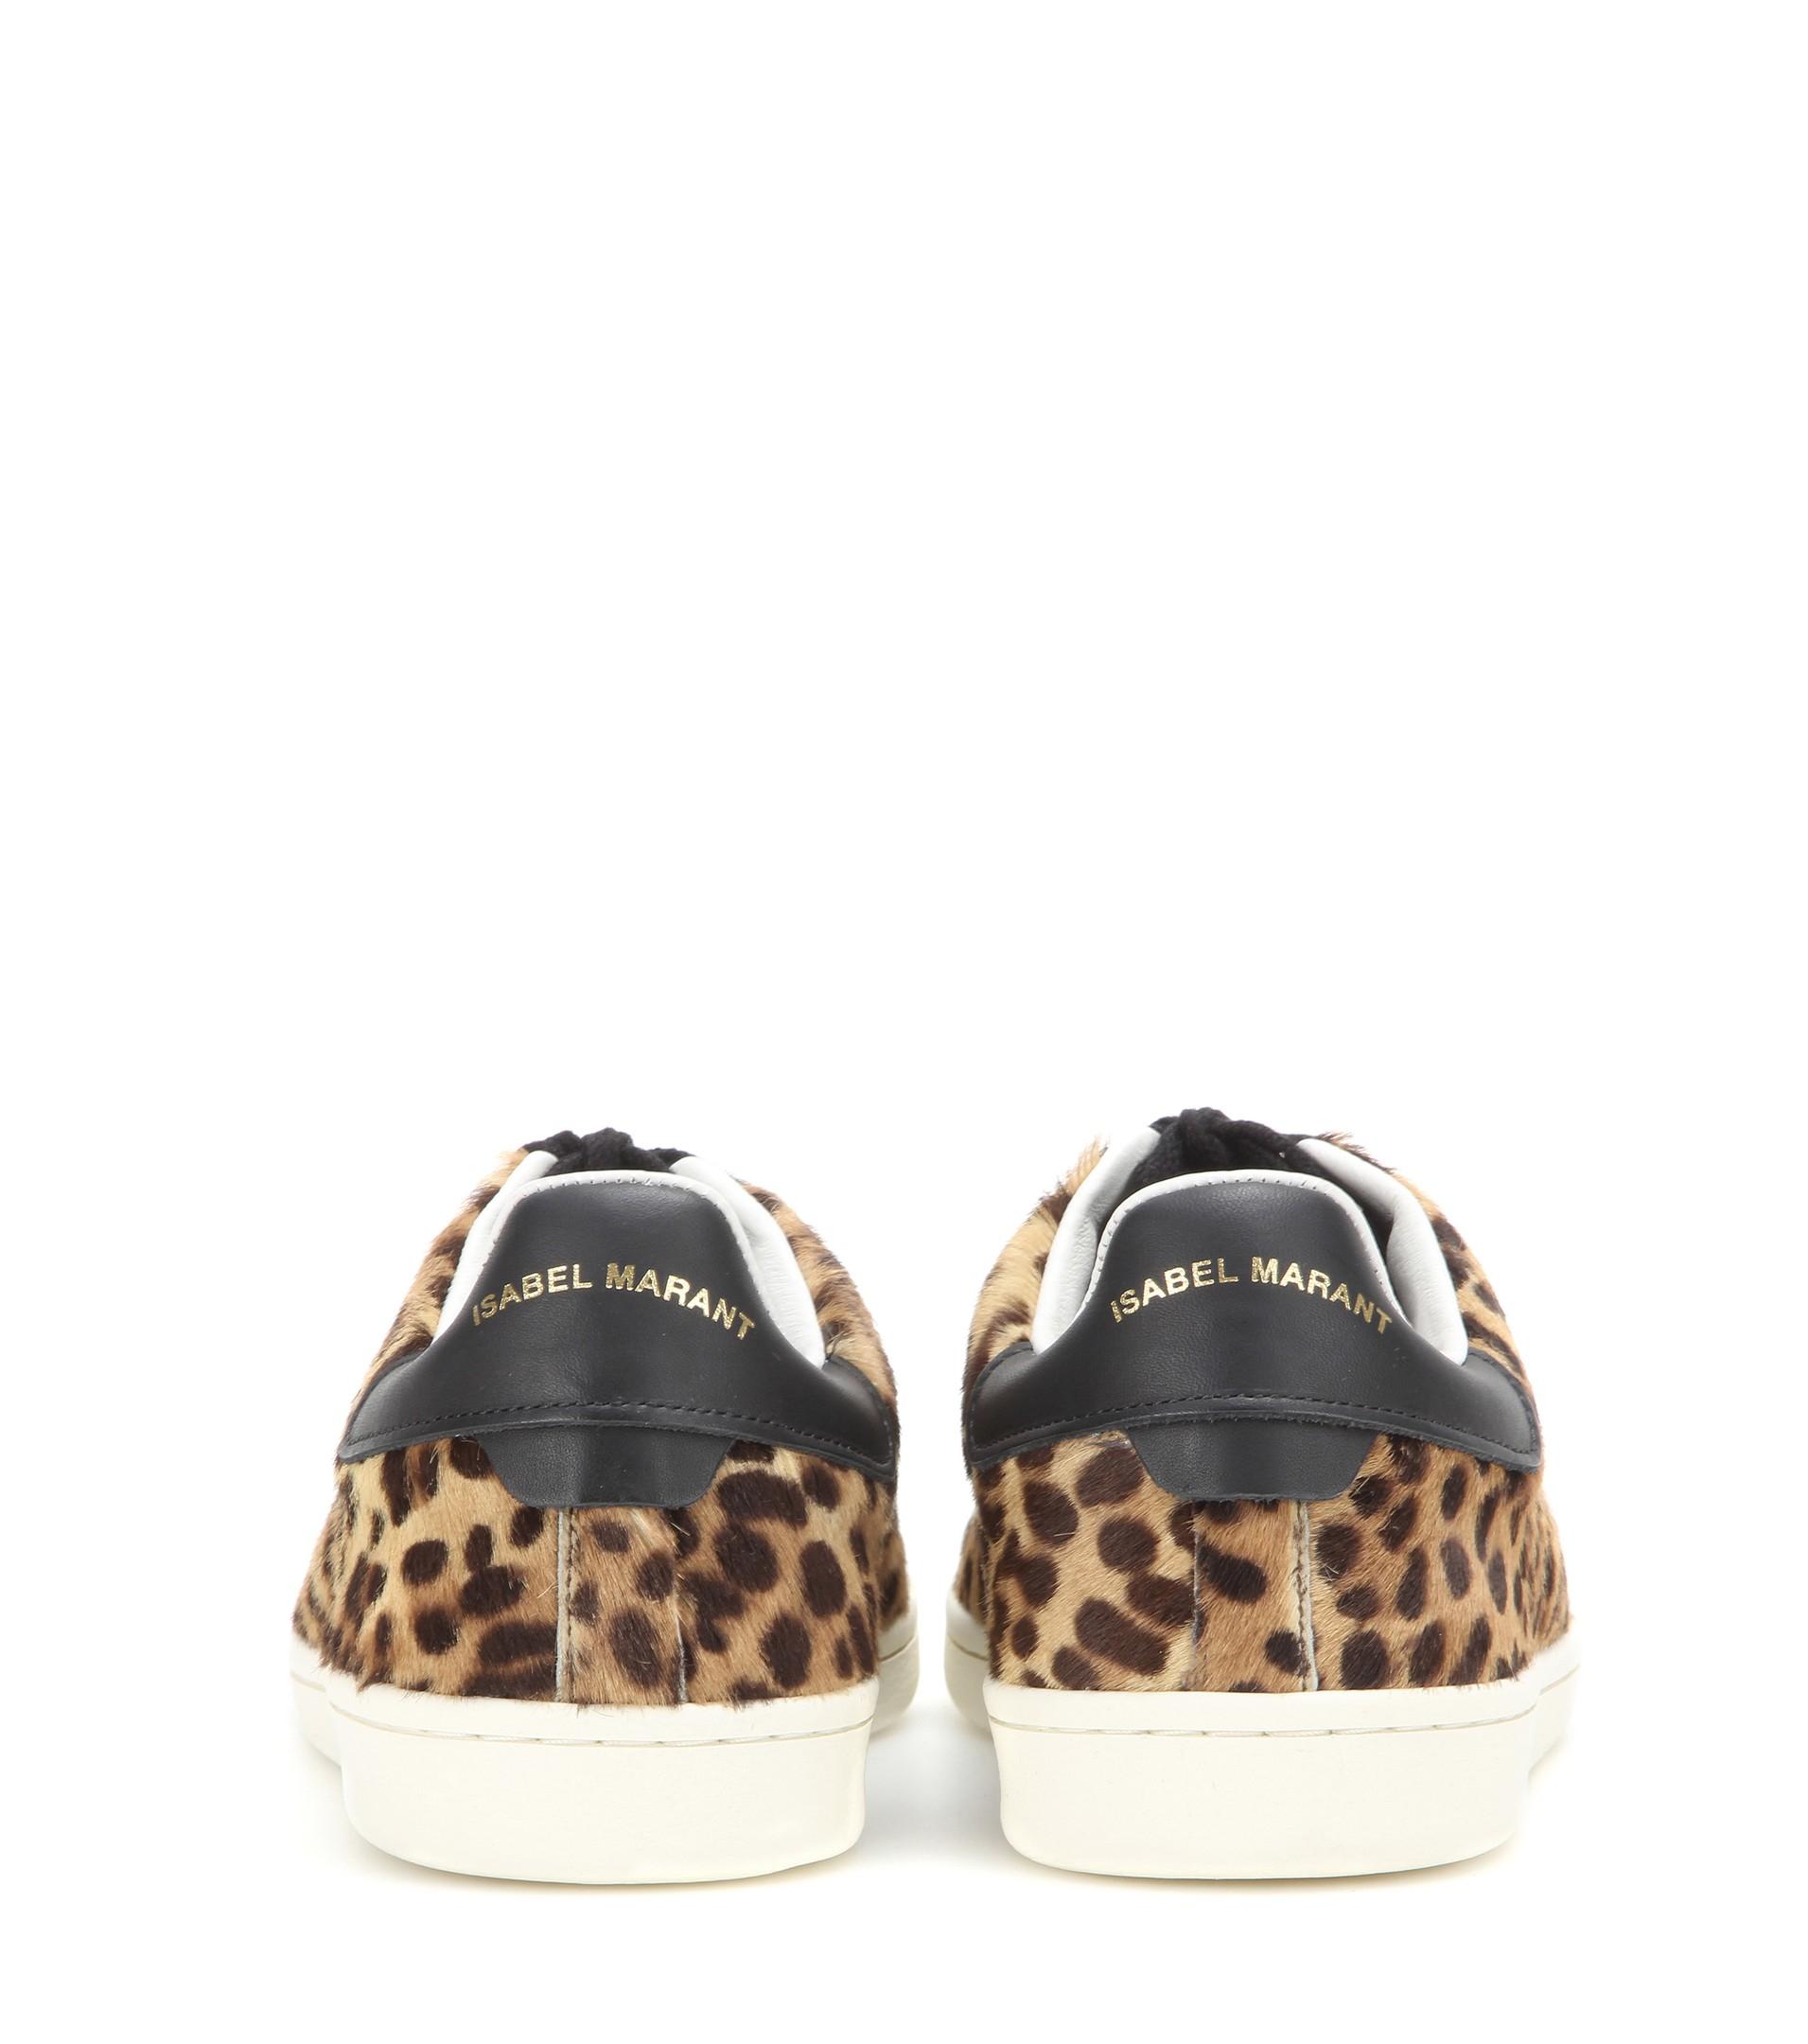 5c0ac7c87755 Isabel Marant Étoile Bart Calf Hair Sneakers - Lyst